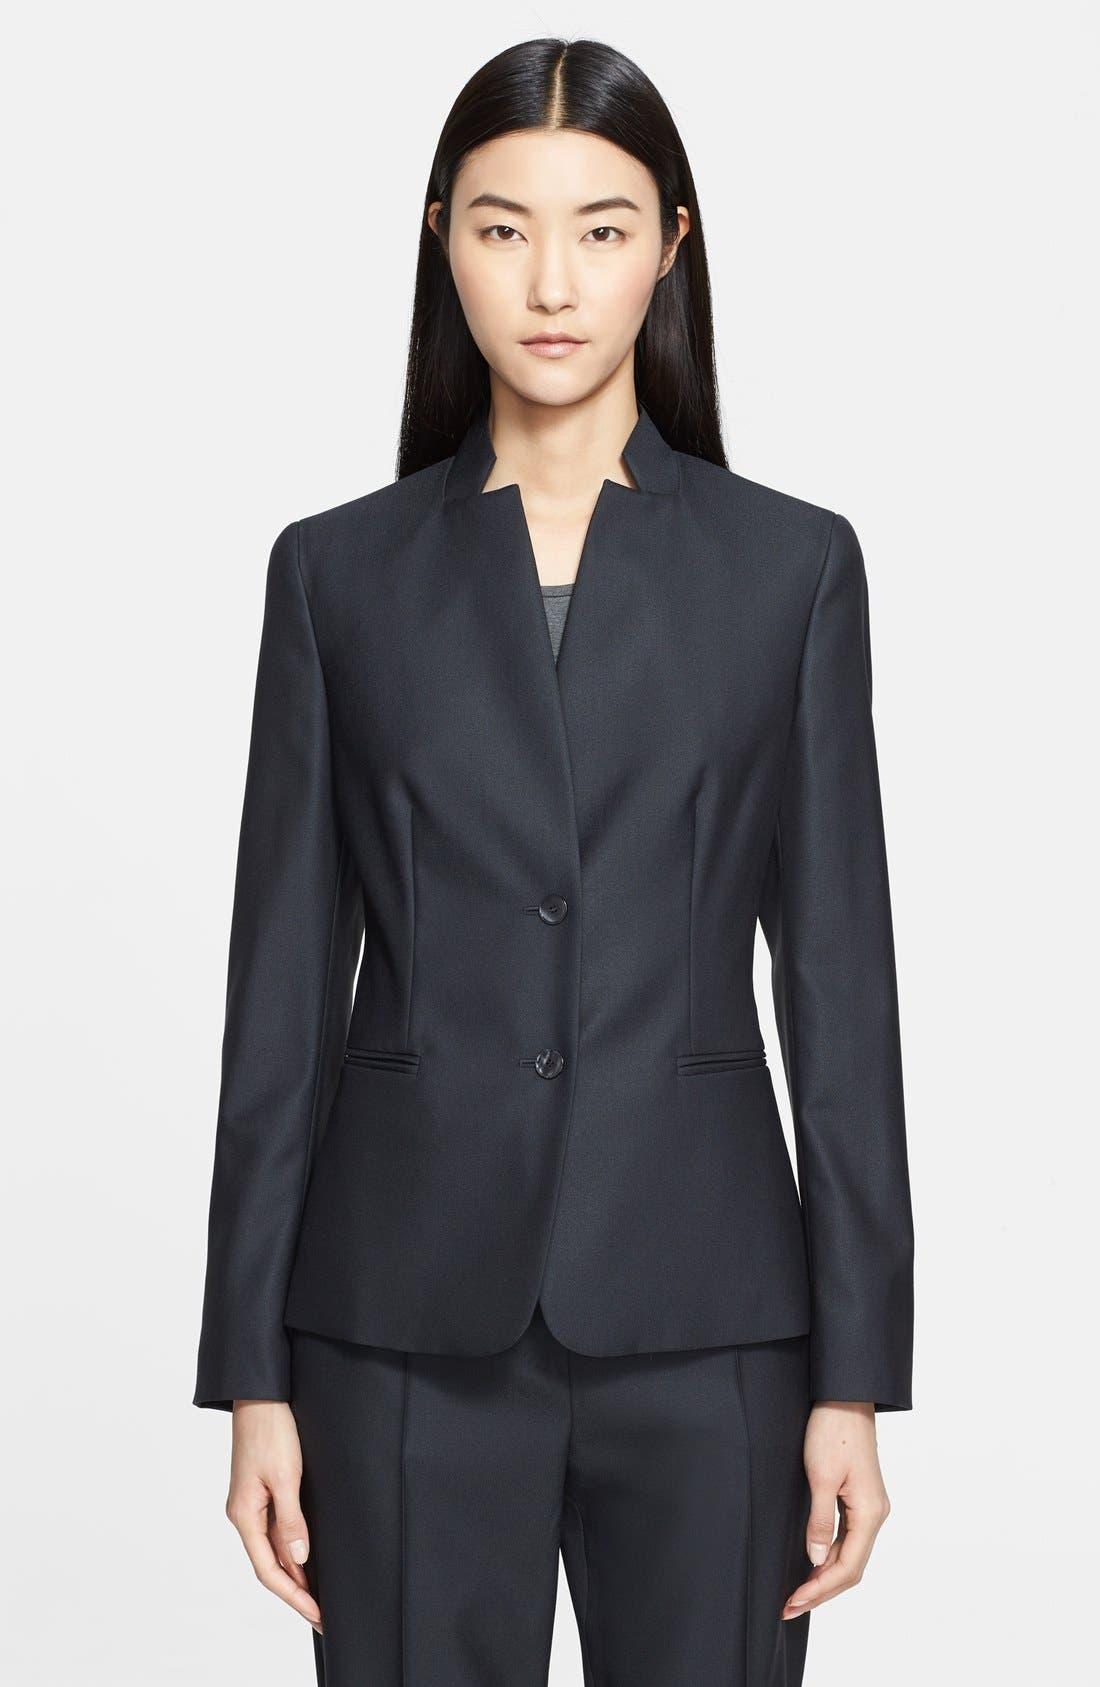 Alternate Image 1 Selected - Max Mara 'Onesti' Wool Blend Jacket